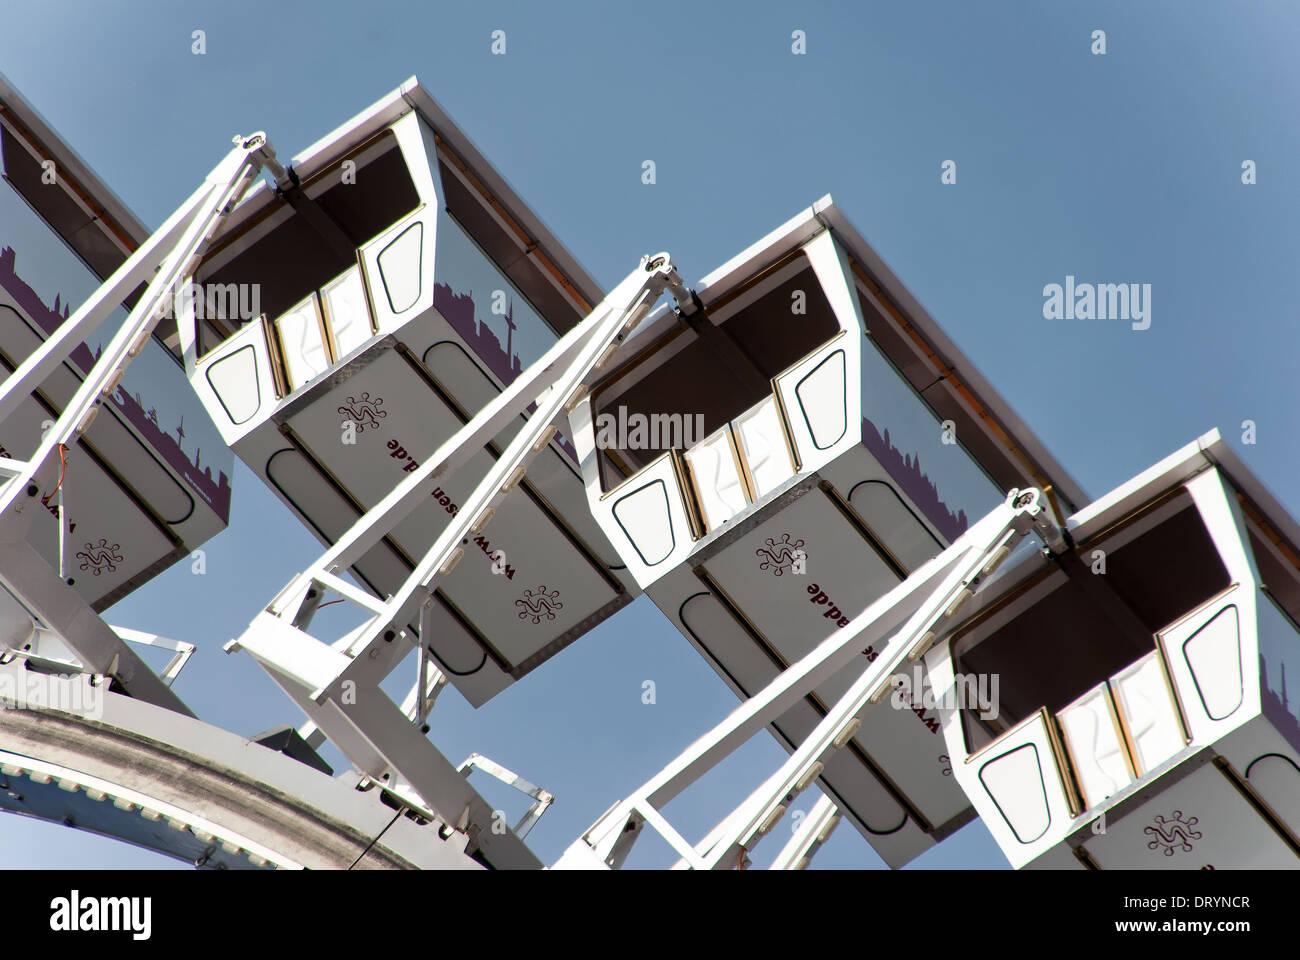 Ferris wheel gondolas in the harbor city Stock Photo